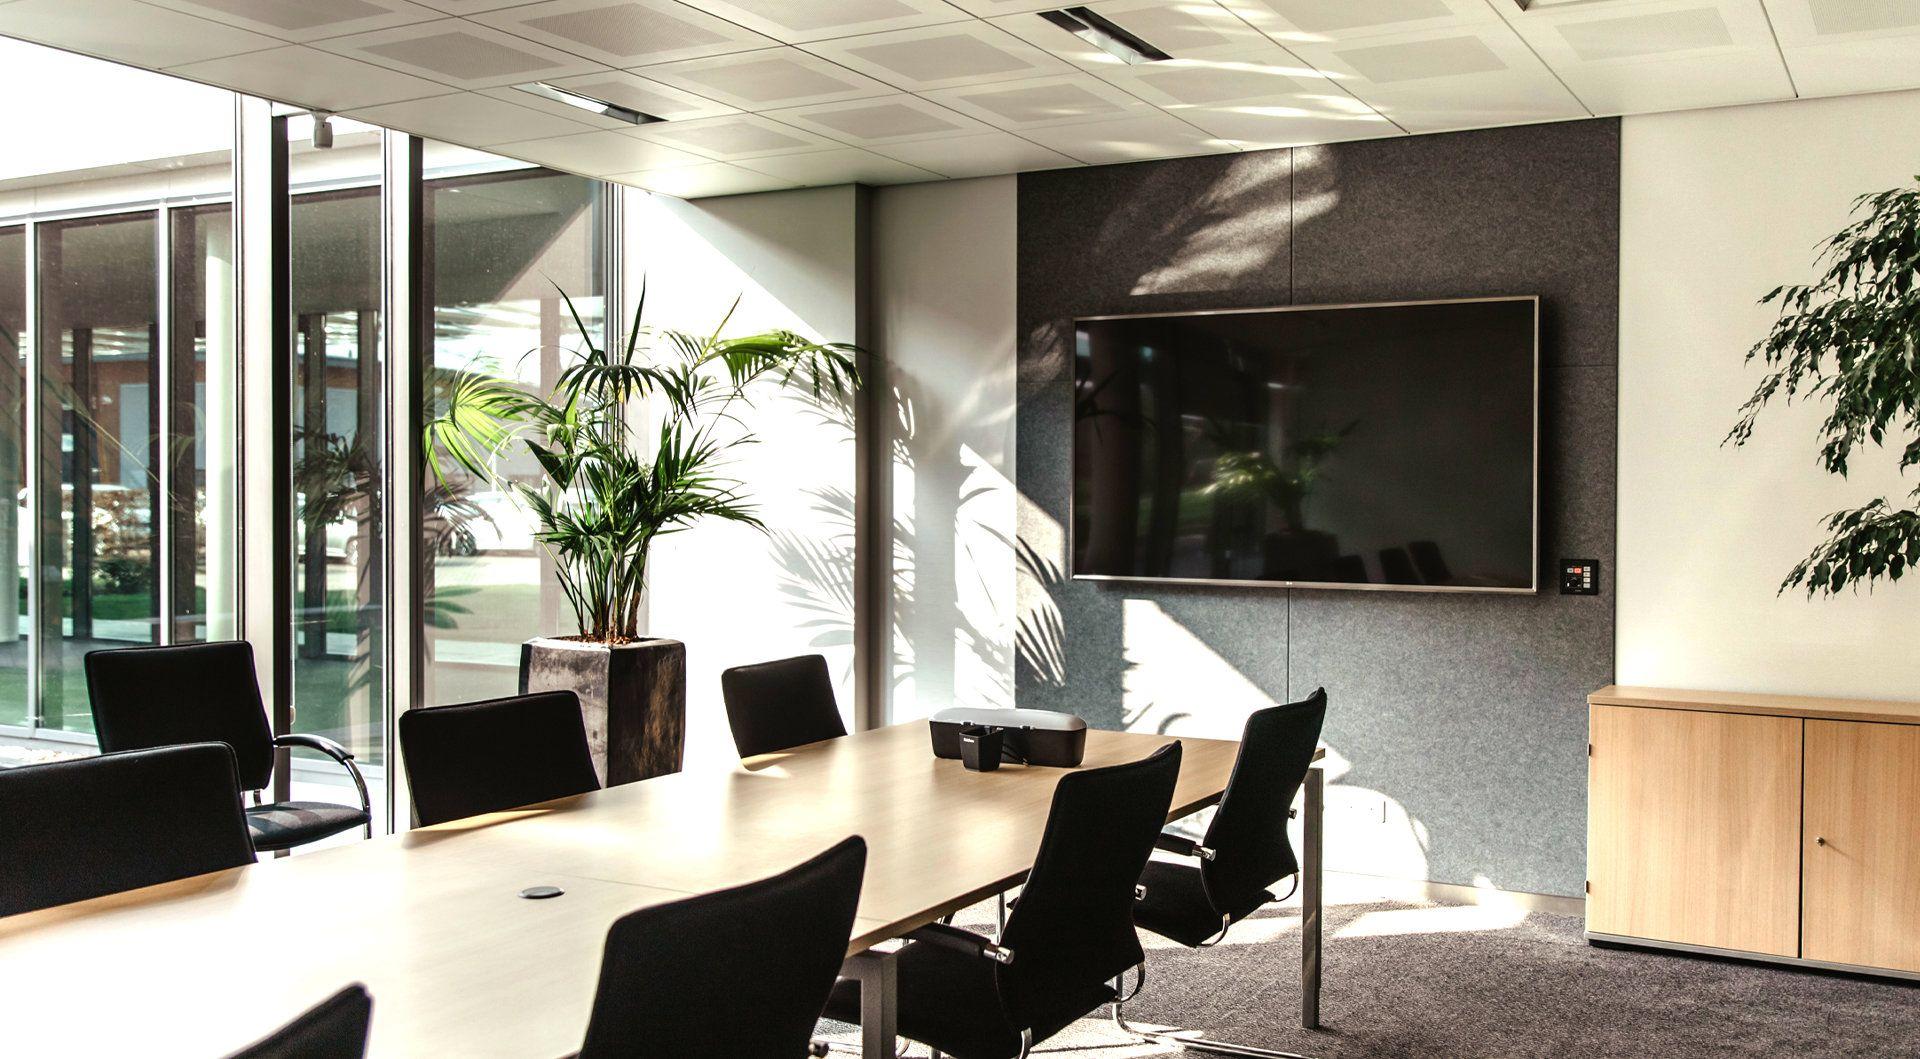 "Benq ST4301K Digitale signage flatscreen 109,2 cm (43"") LED 4K Ultra HD Zwart - Case studie de vries"